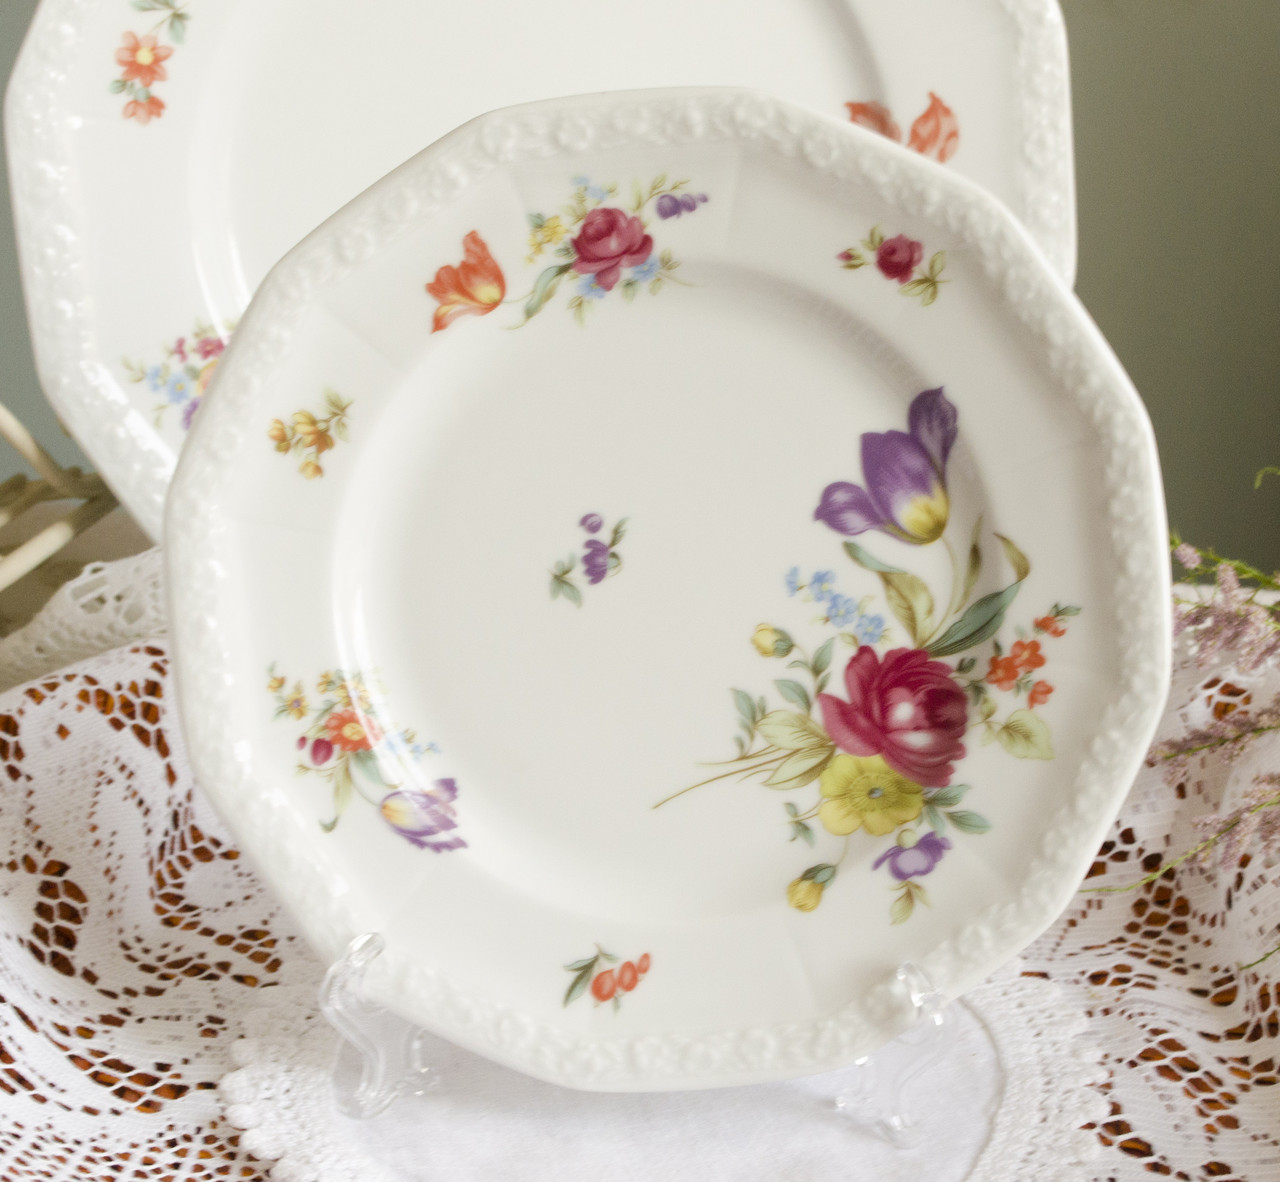 Коллекционная фарфоровая тарелка, Rosenthal, кoллекция Маriа Sommerstraus, Германия